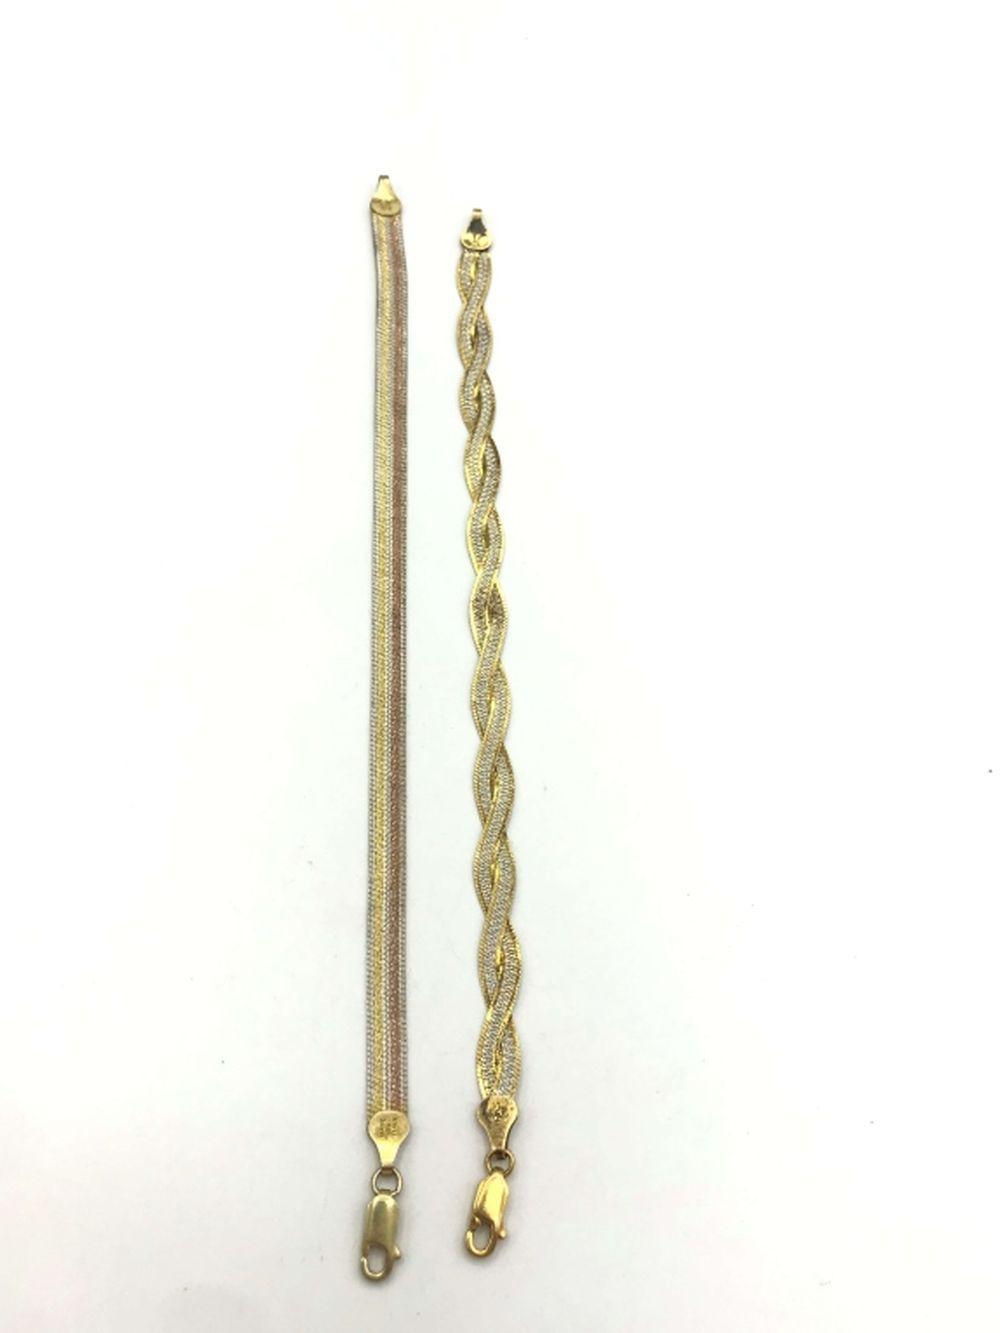 2 GOLD TONE BRACELETS W PRETTY STONE/DESIGN